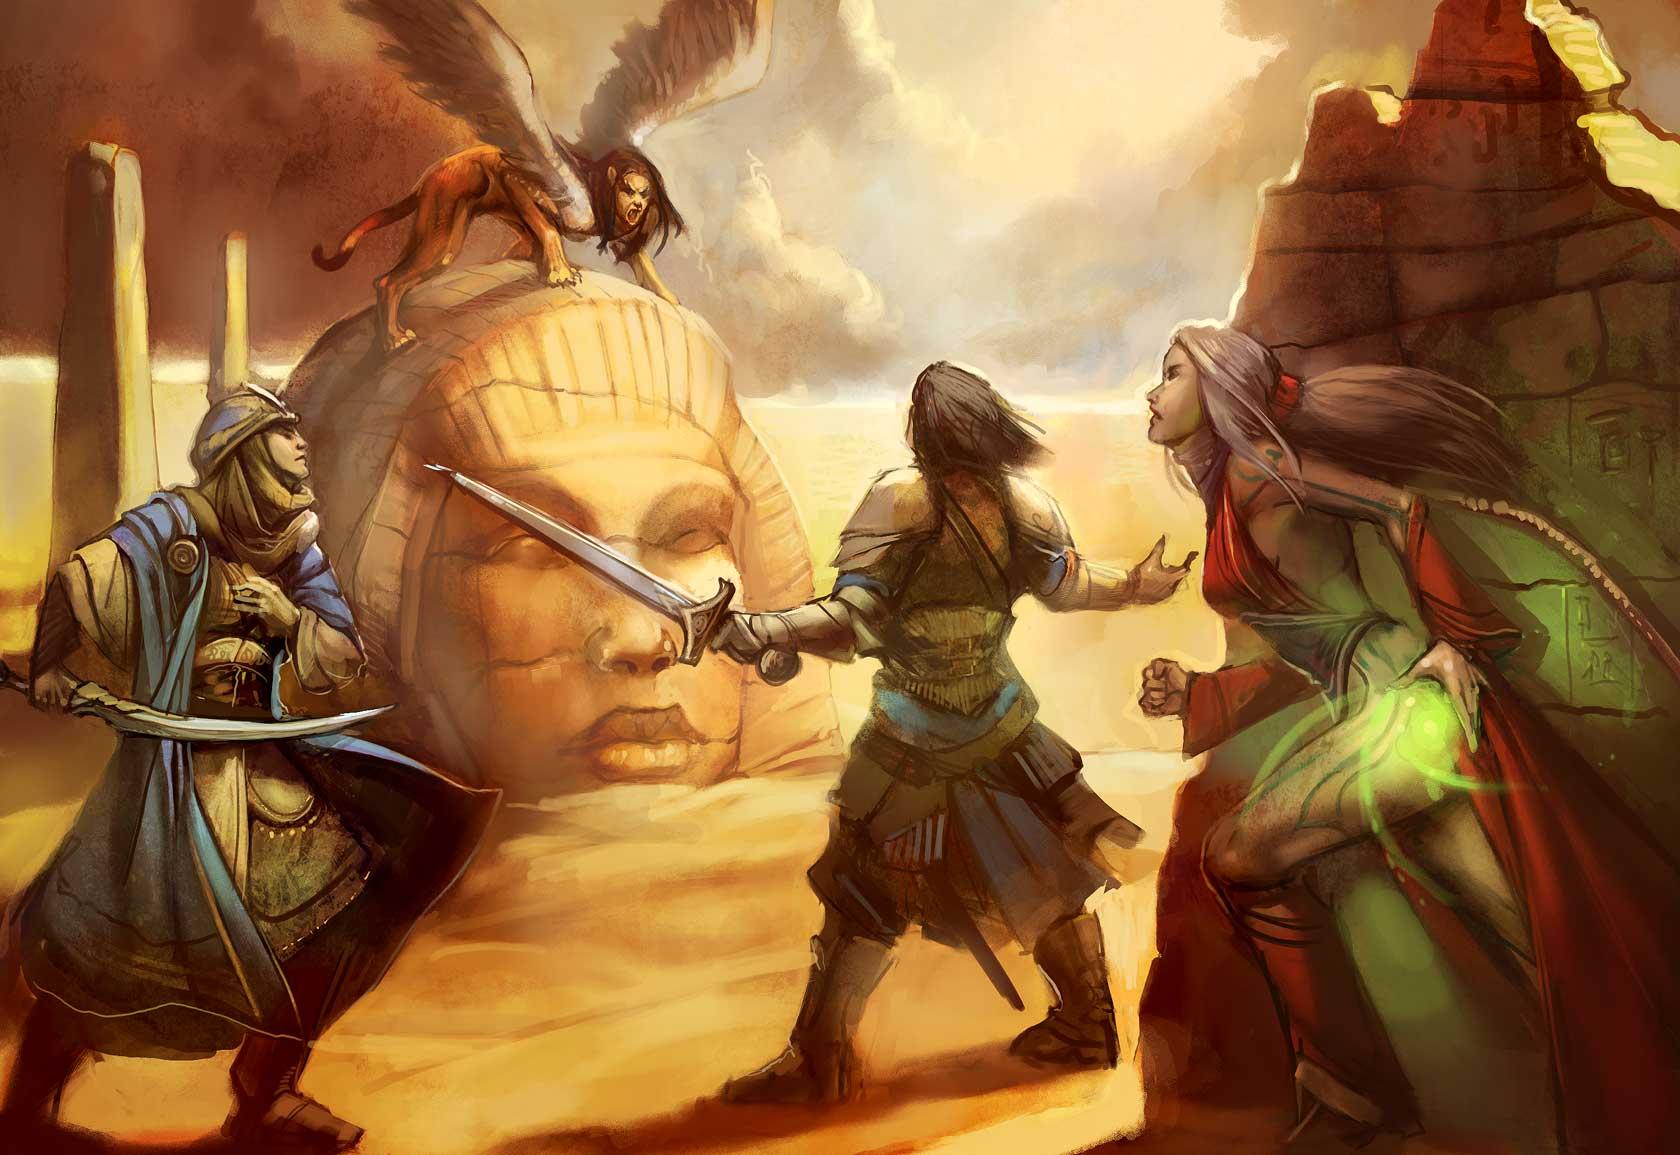 Egypt Warrior Illustration Anubis Pyramid Fantasy Art: FANDOM Powered By Wikia